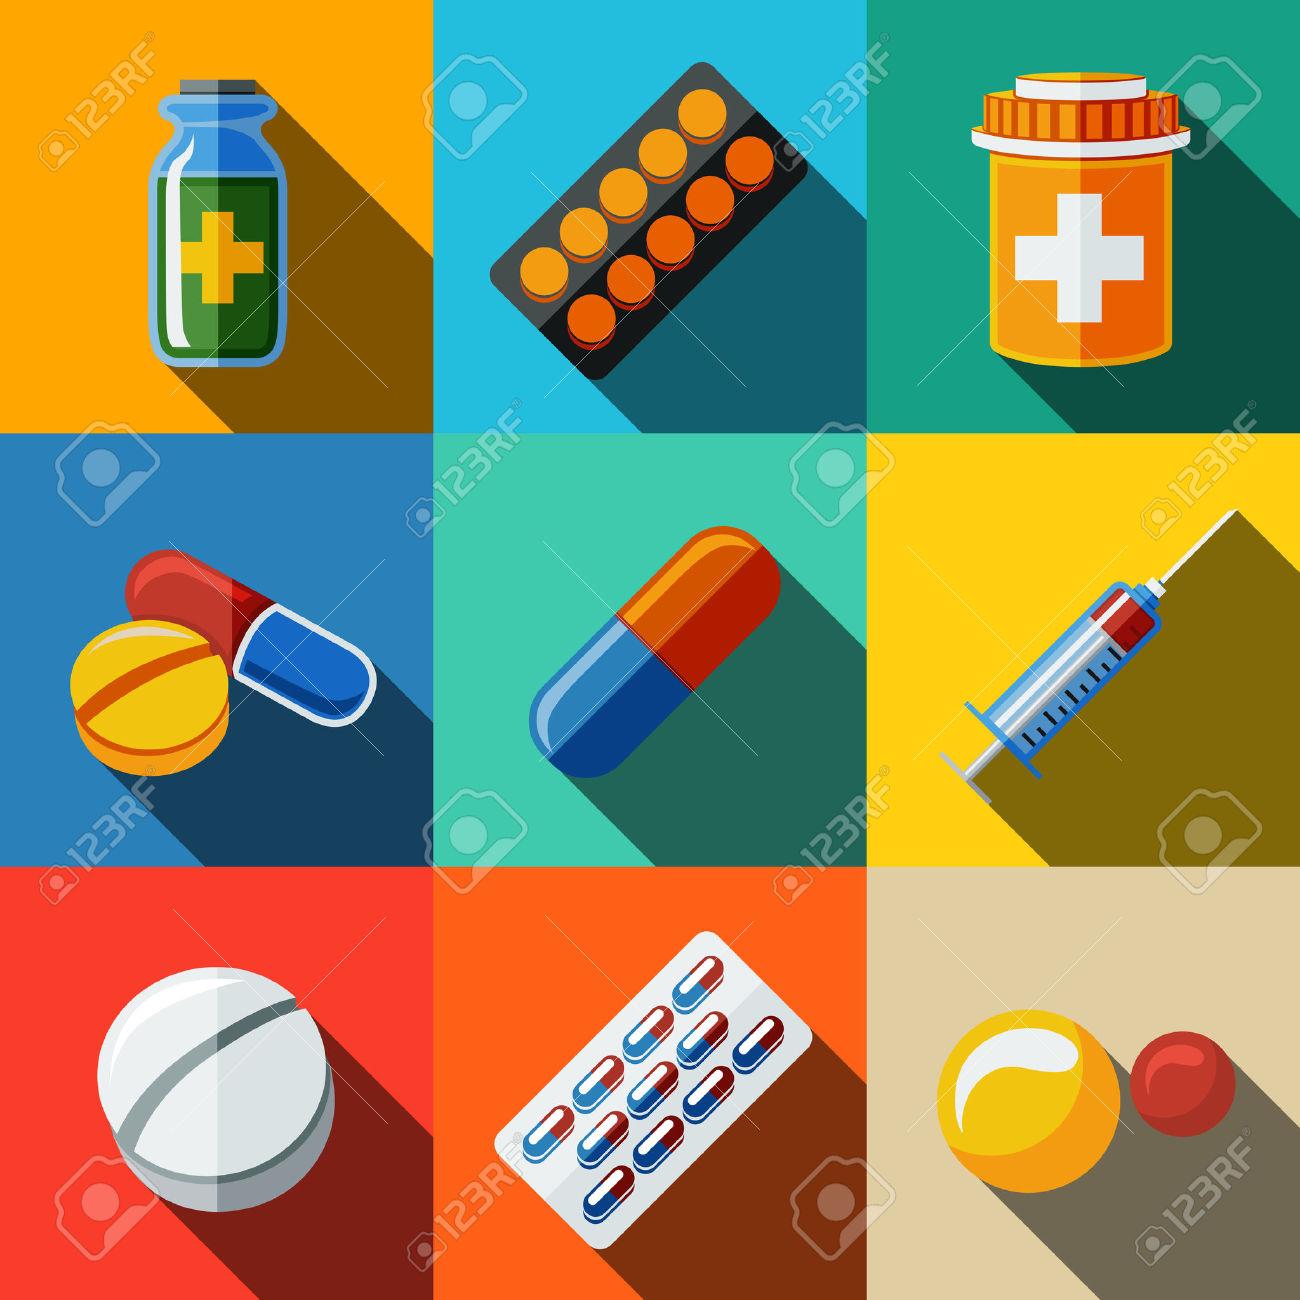 Box of little red pills clipart.